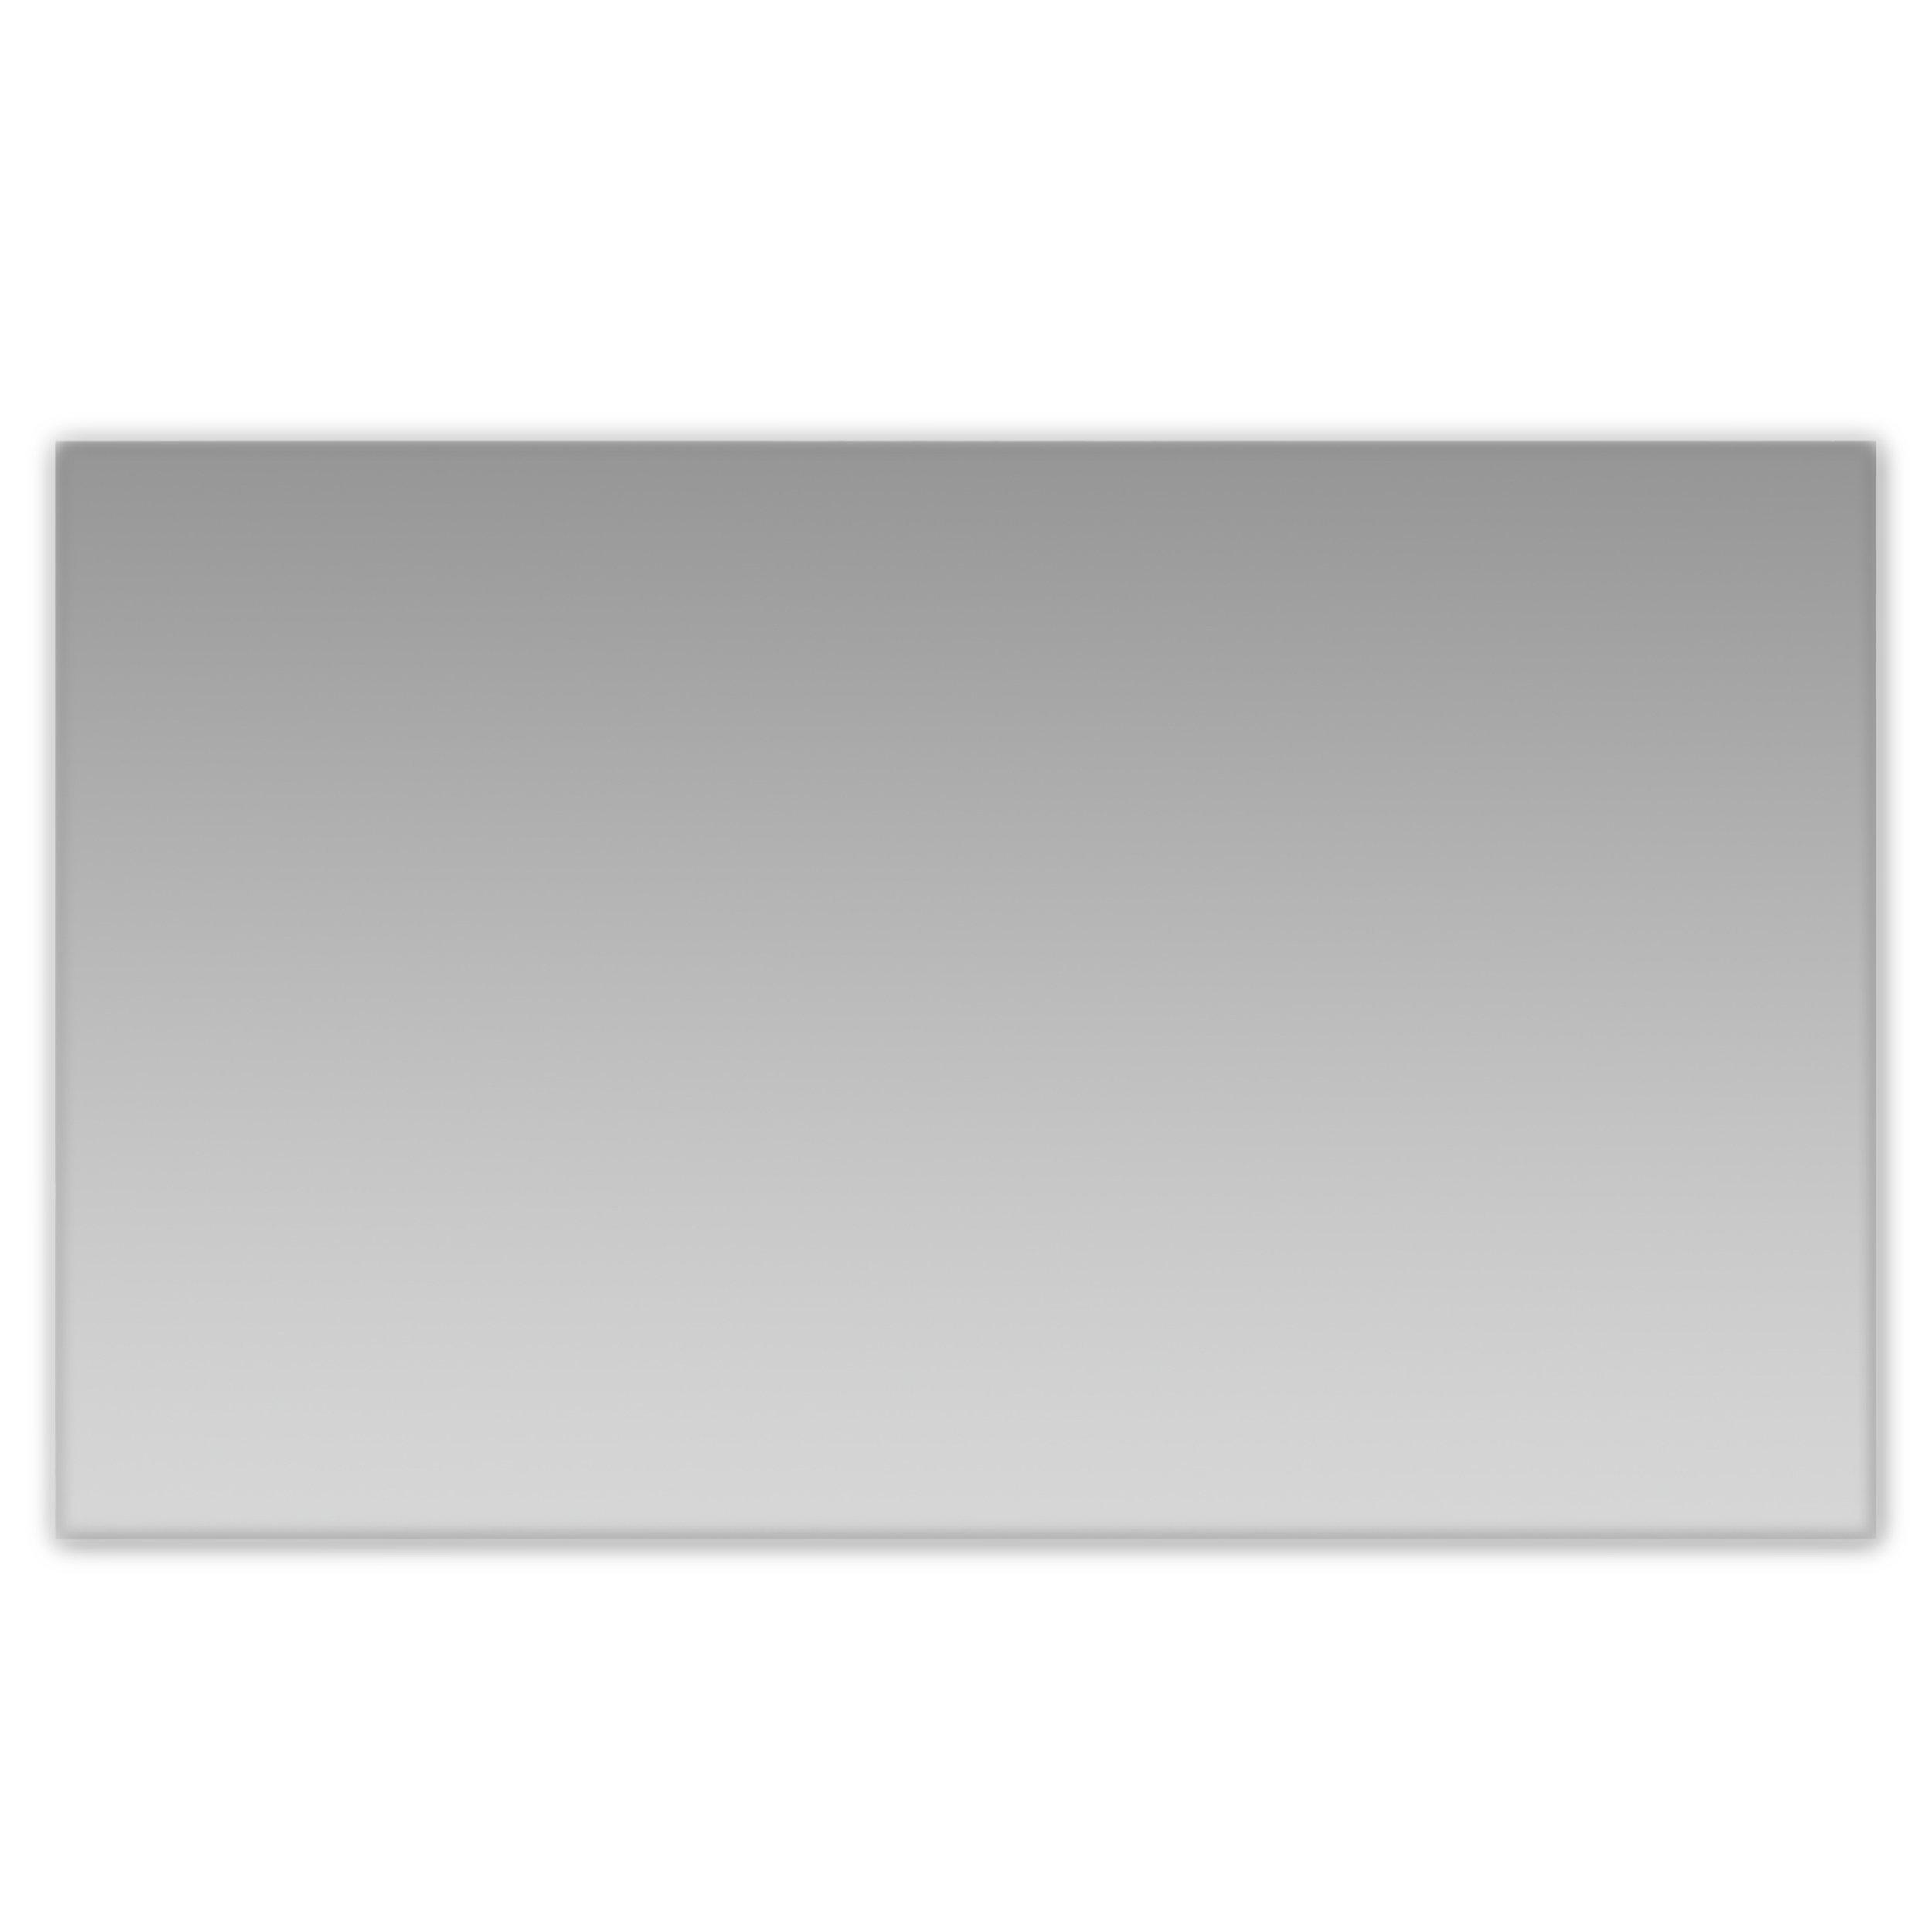 Eviva EVMR05-48X30 Sleek 48'' Frameless Bathroom Mirror Combination, Glass